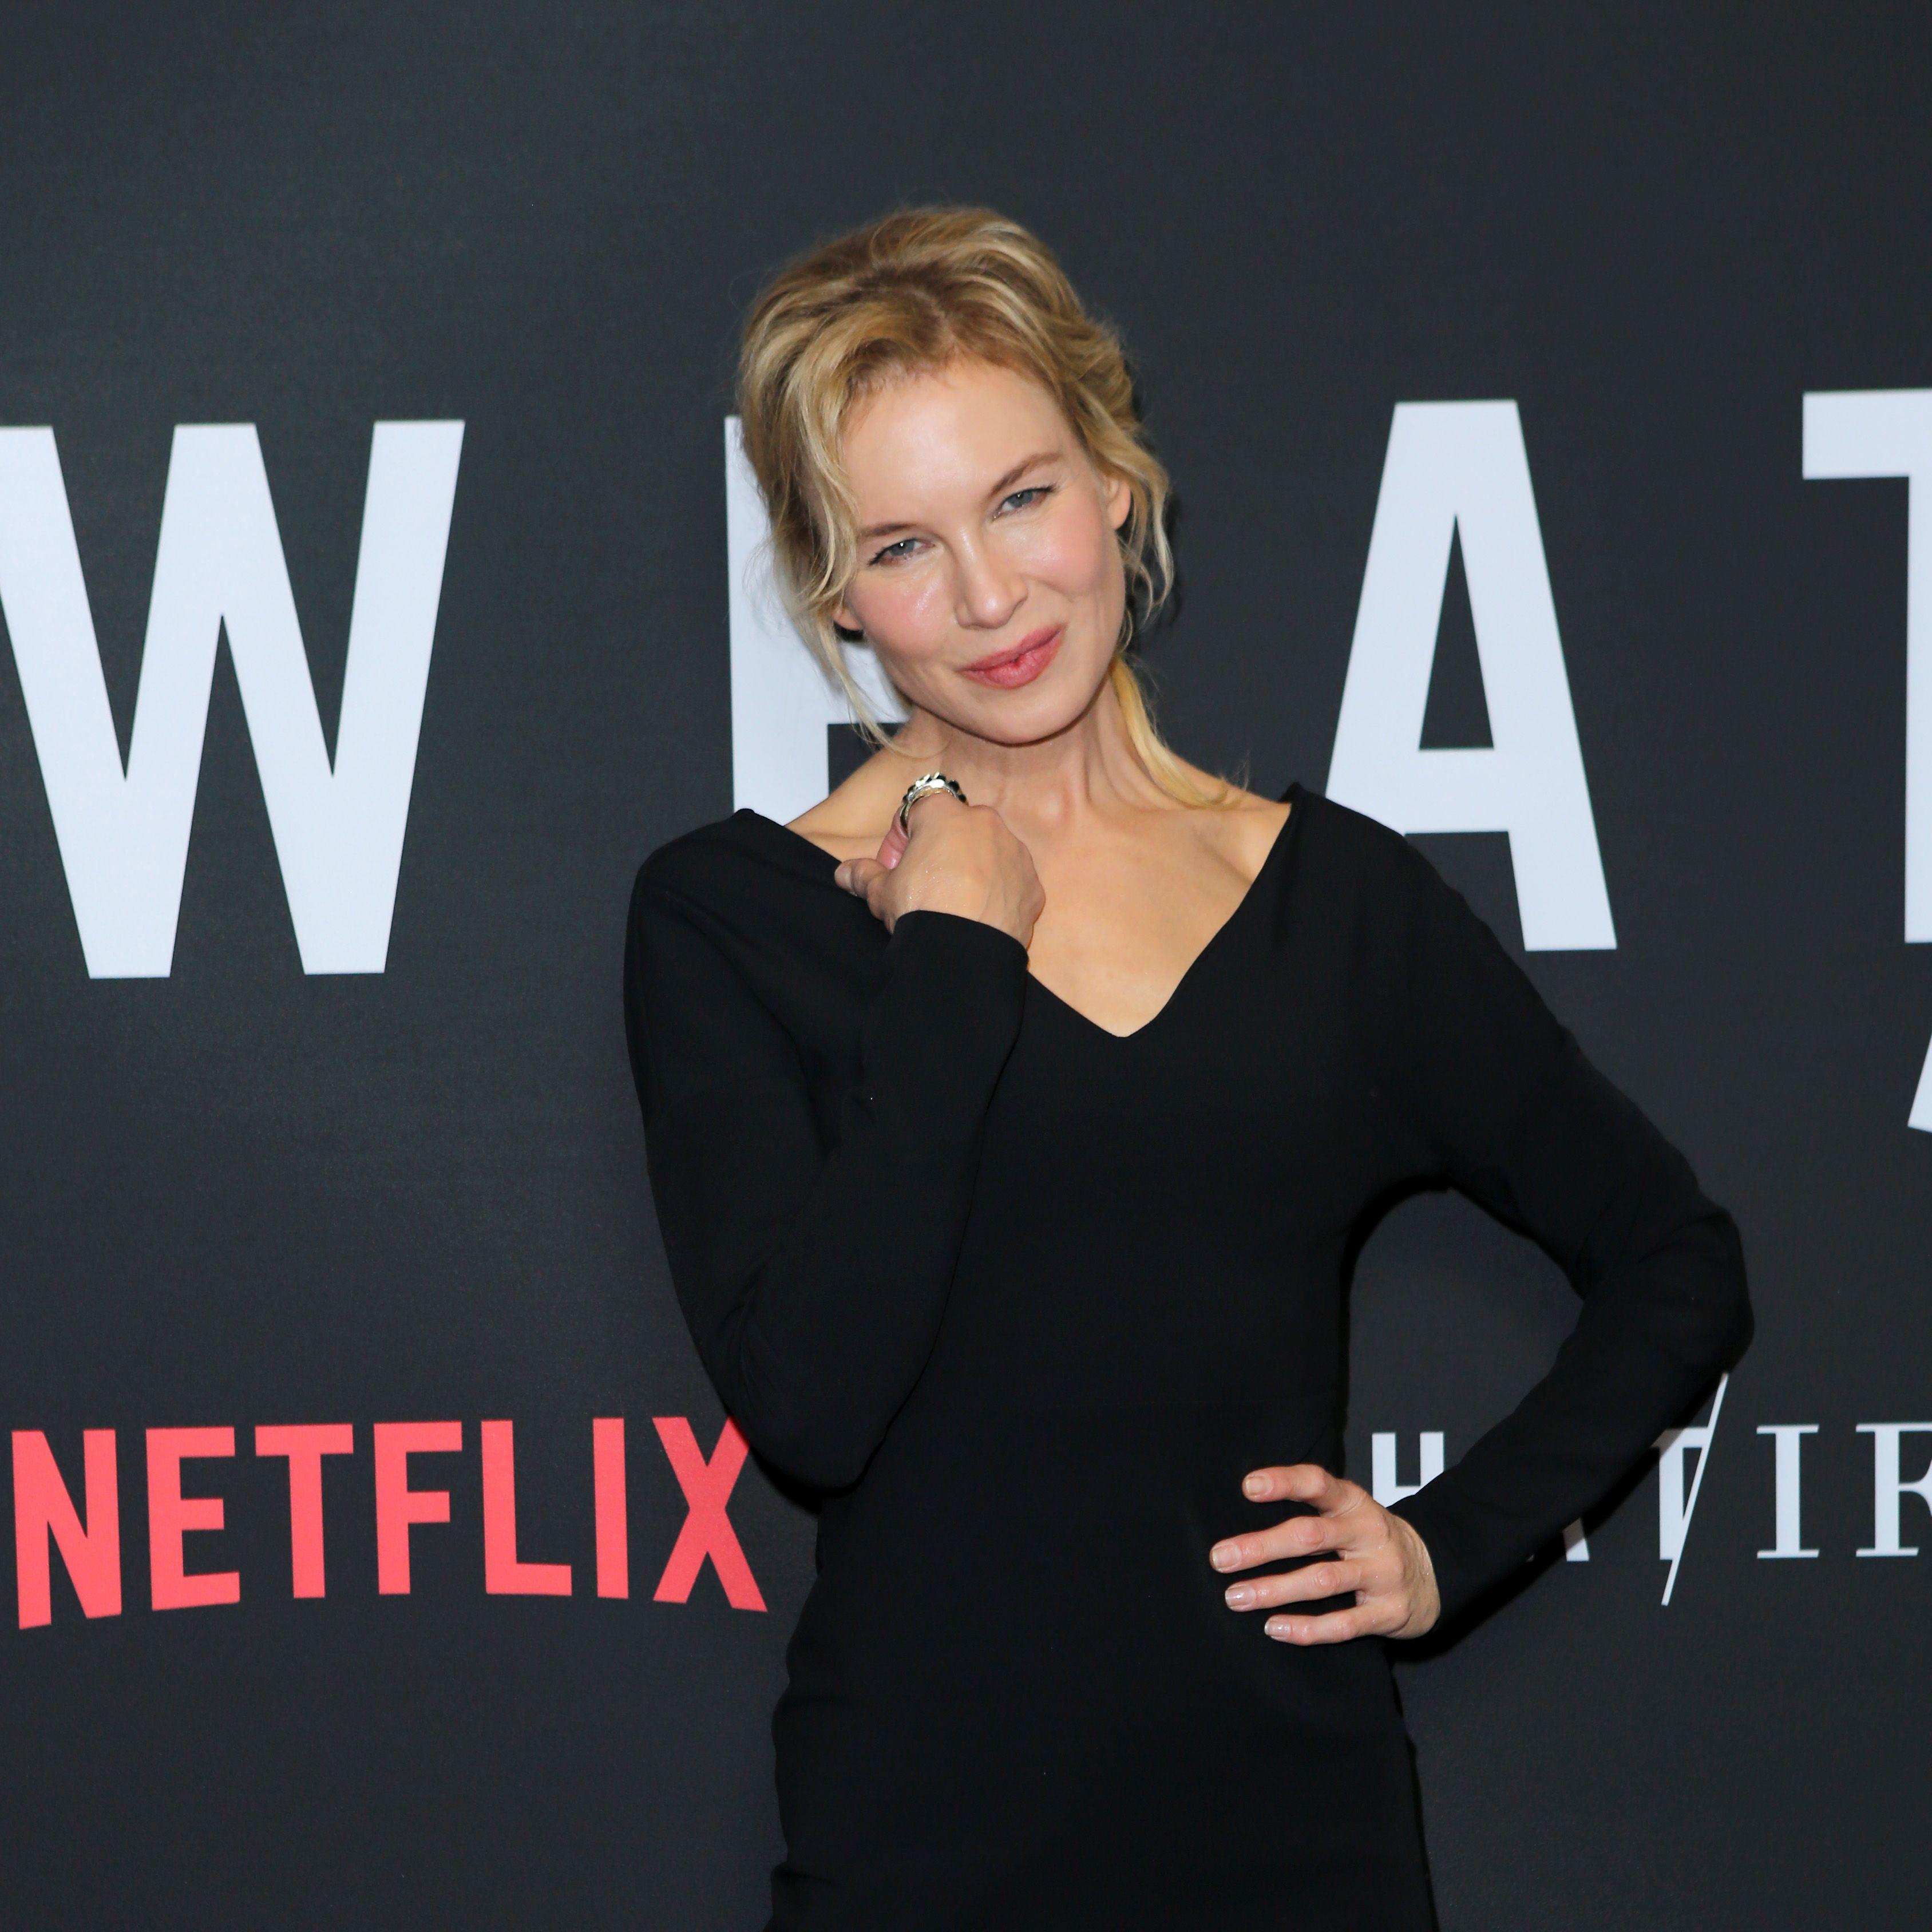 Renee Zellweger says a fourth Bridget Jones film is a possibility